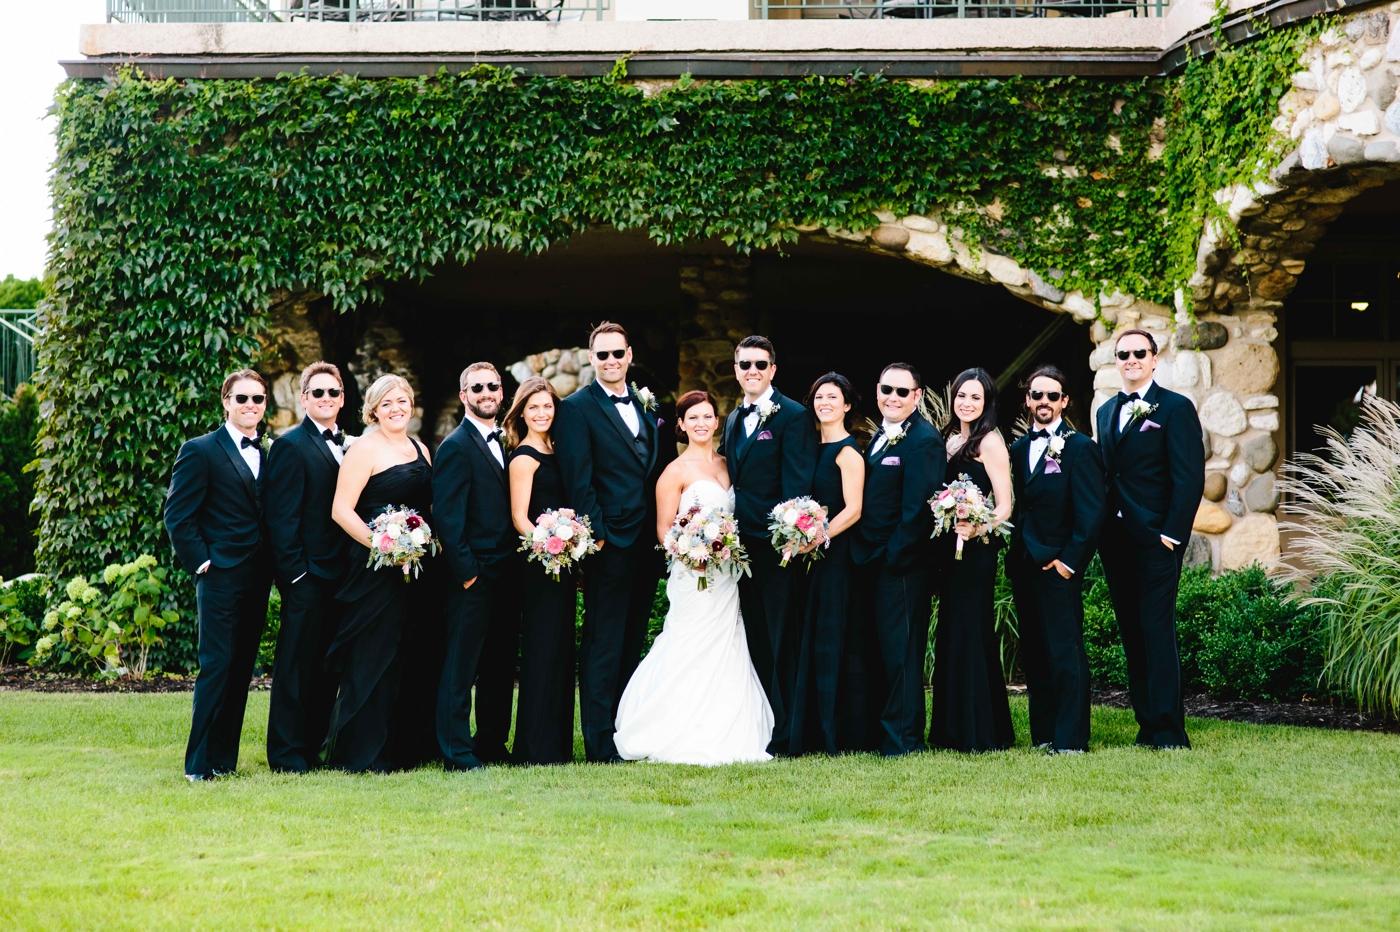 chicago-fine-art-wedding-photography-friel30